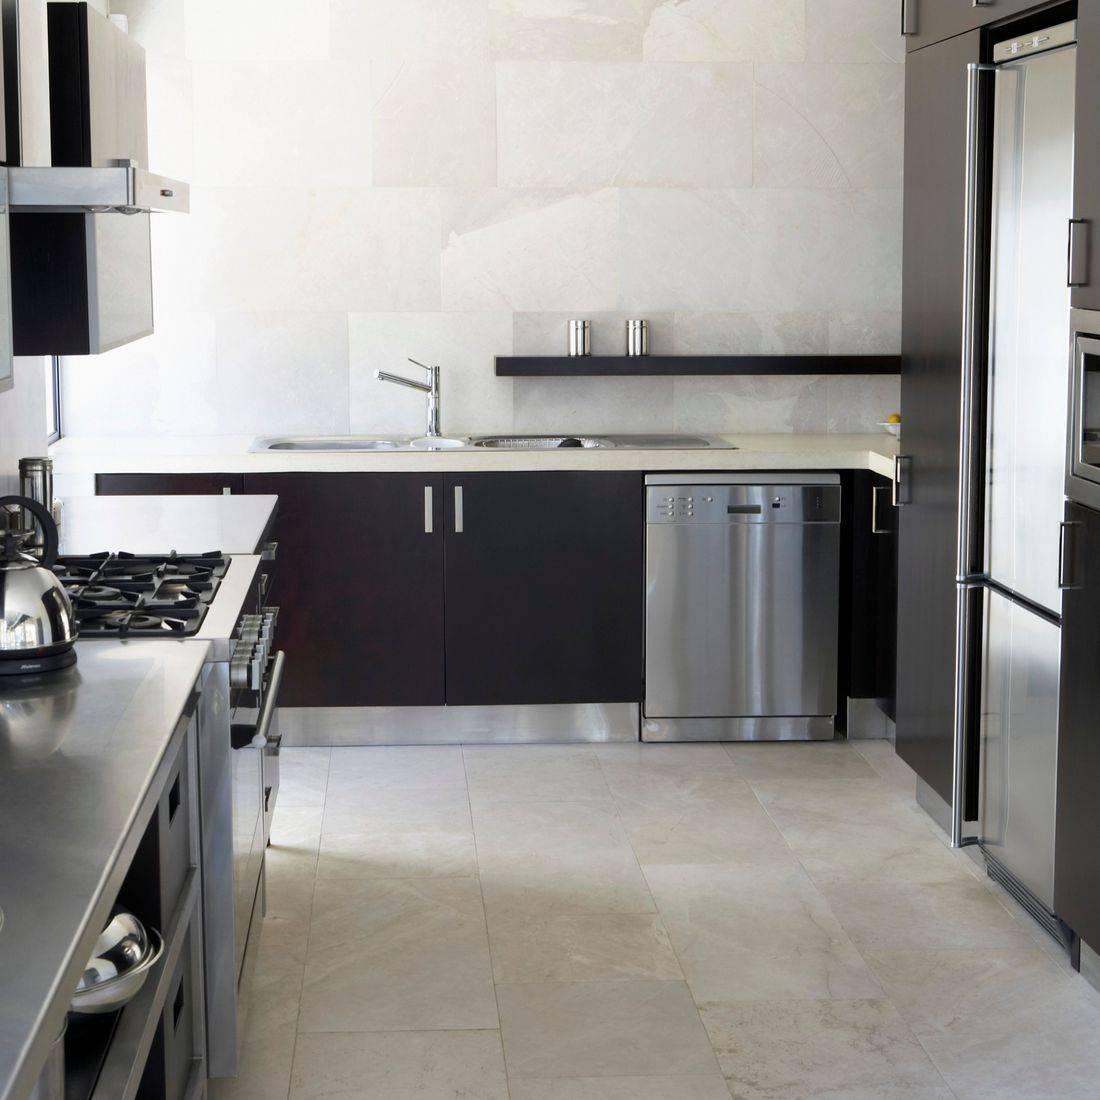 Home Cleaning Services Buffalo, NY